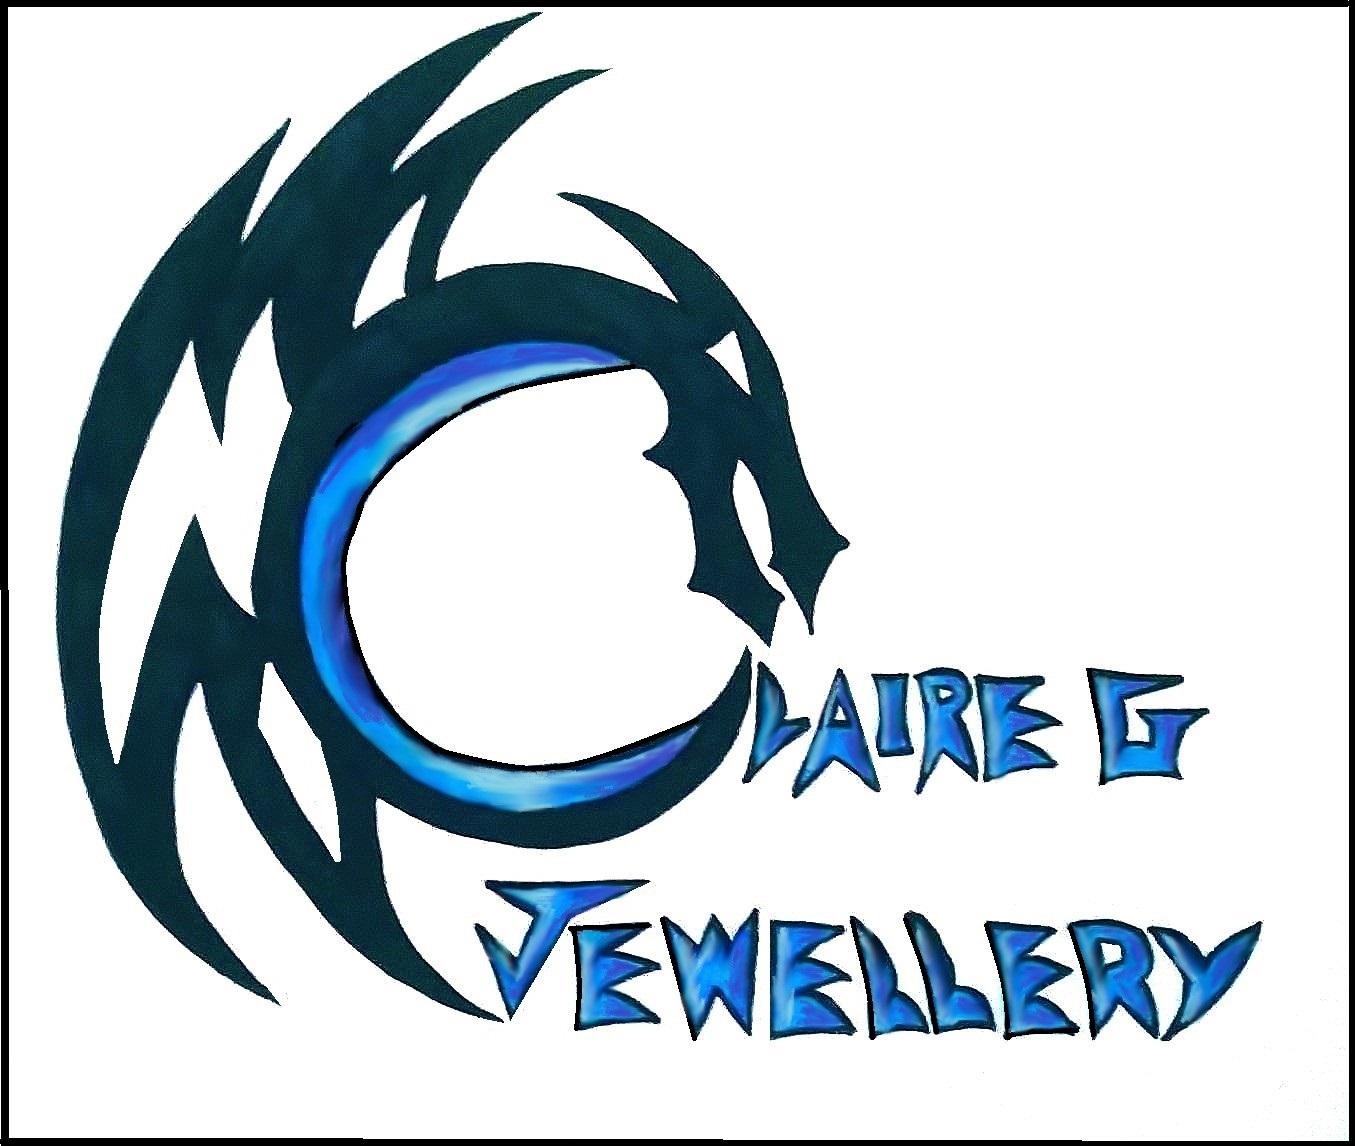 claireg_jewellerylogovistaprint_1jpg